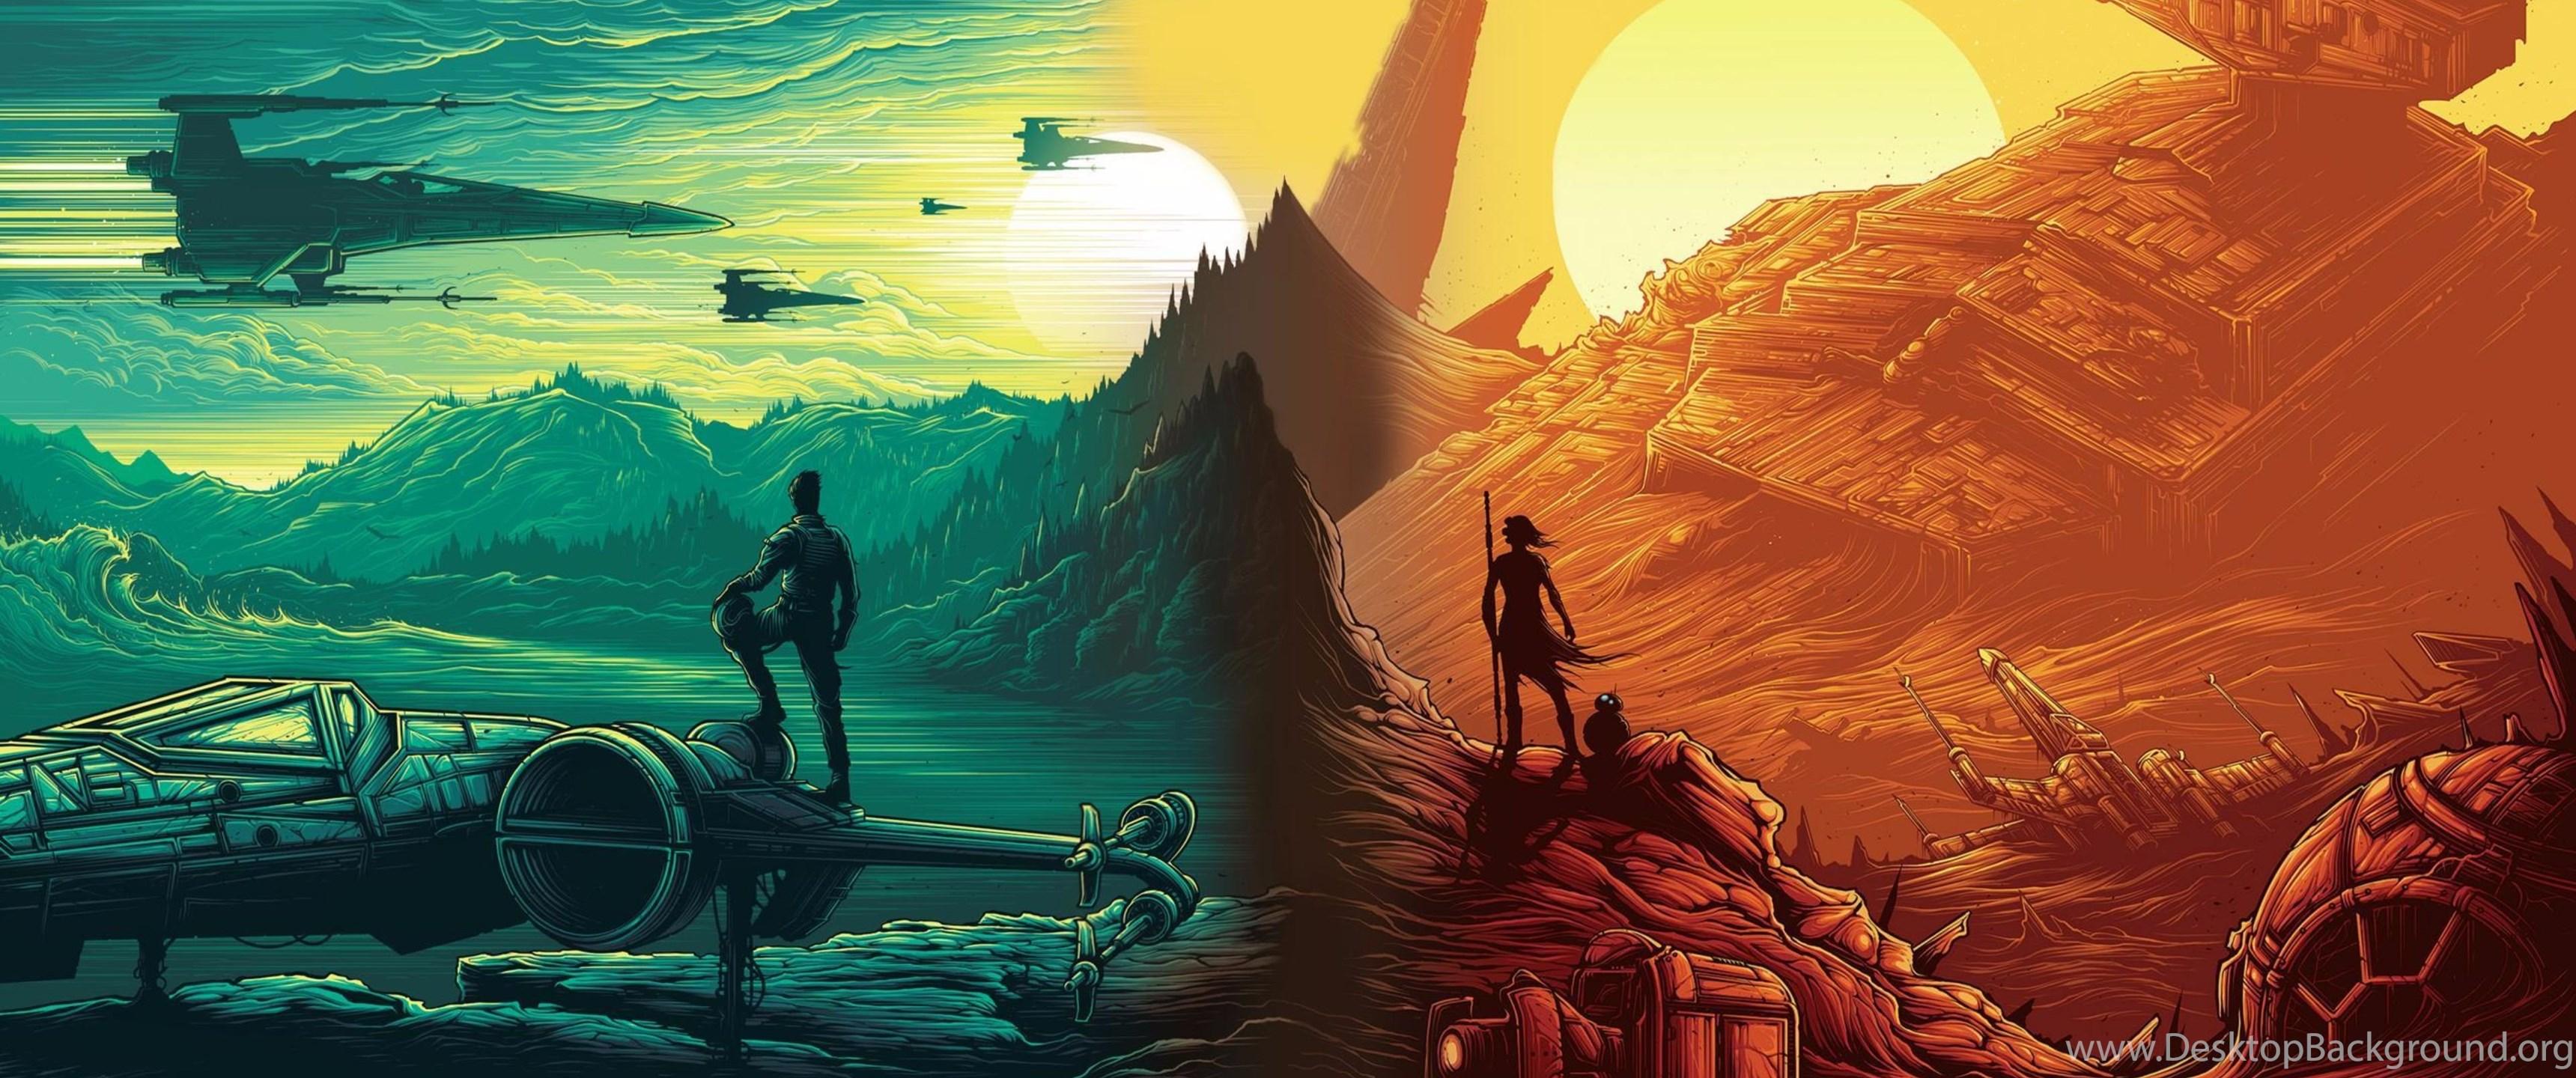 Cartoon Star Wars The Force Awakens 4K Wallpapers Desktop ...